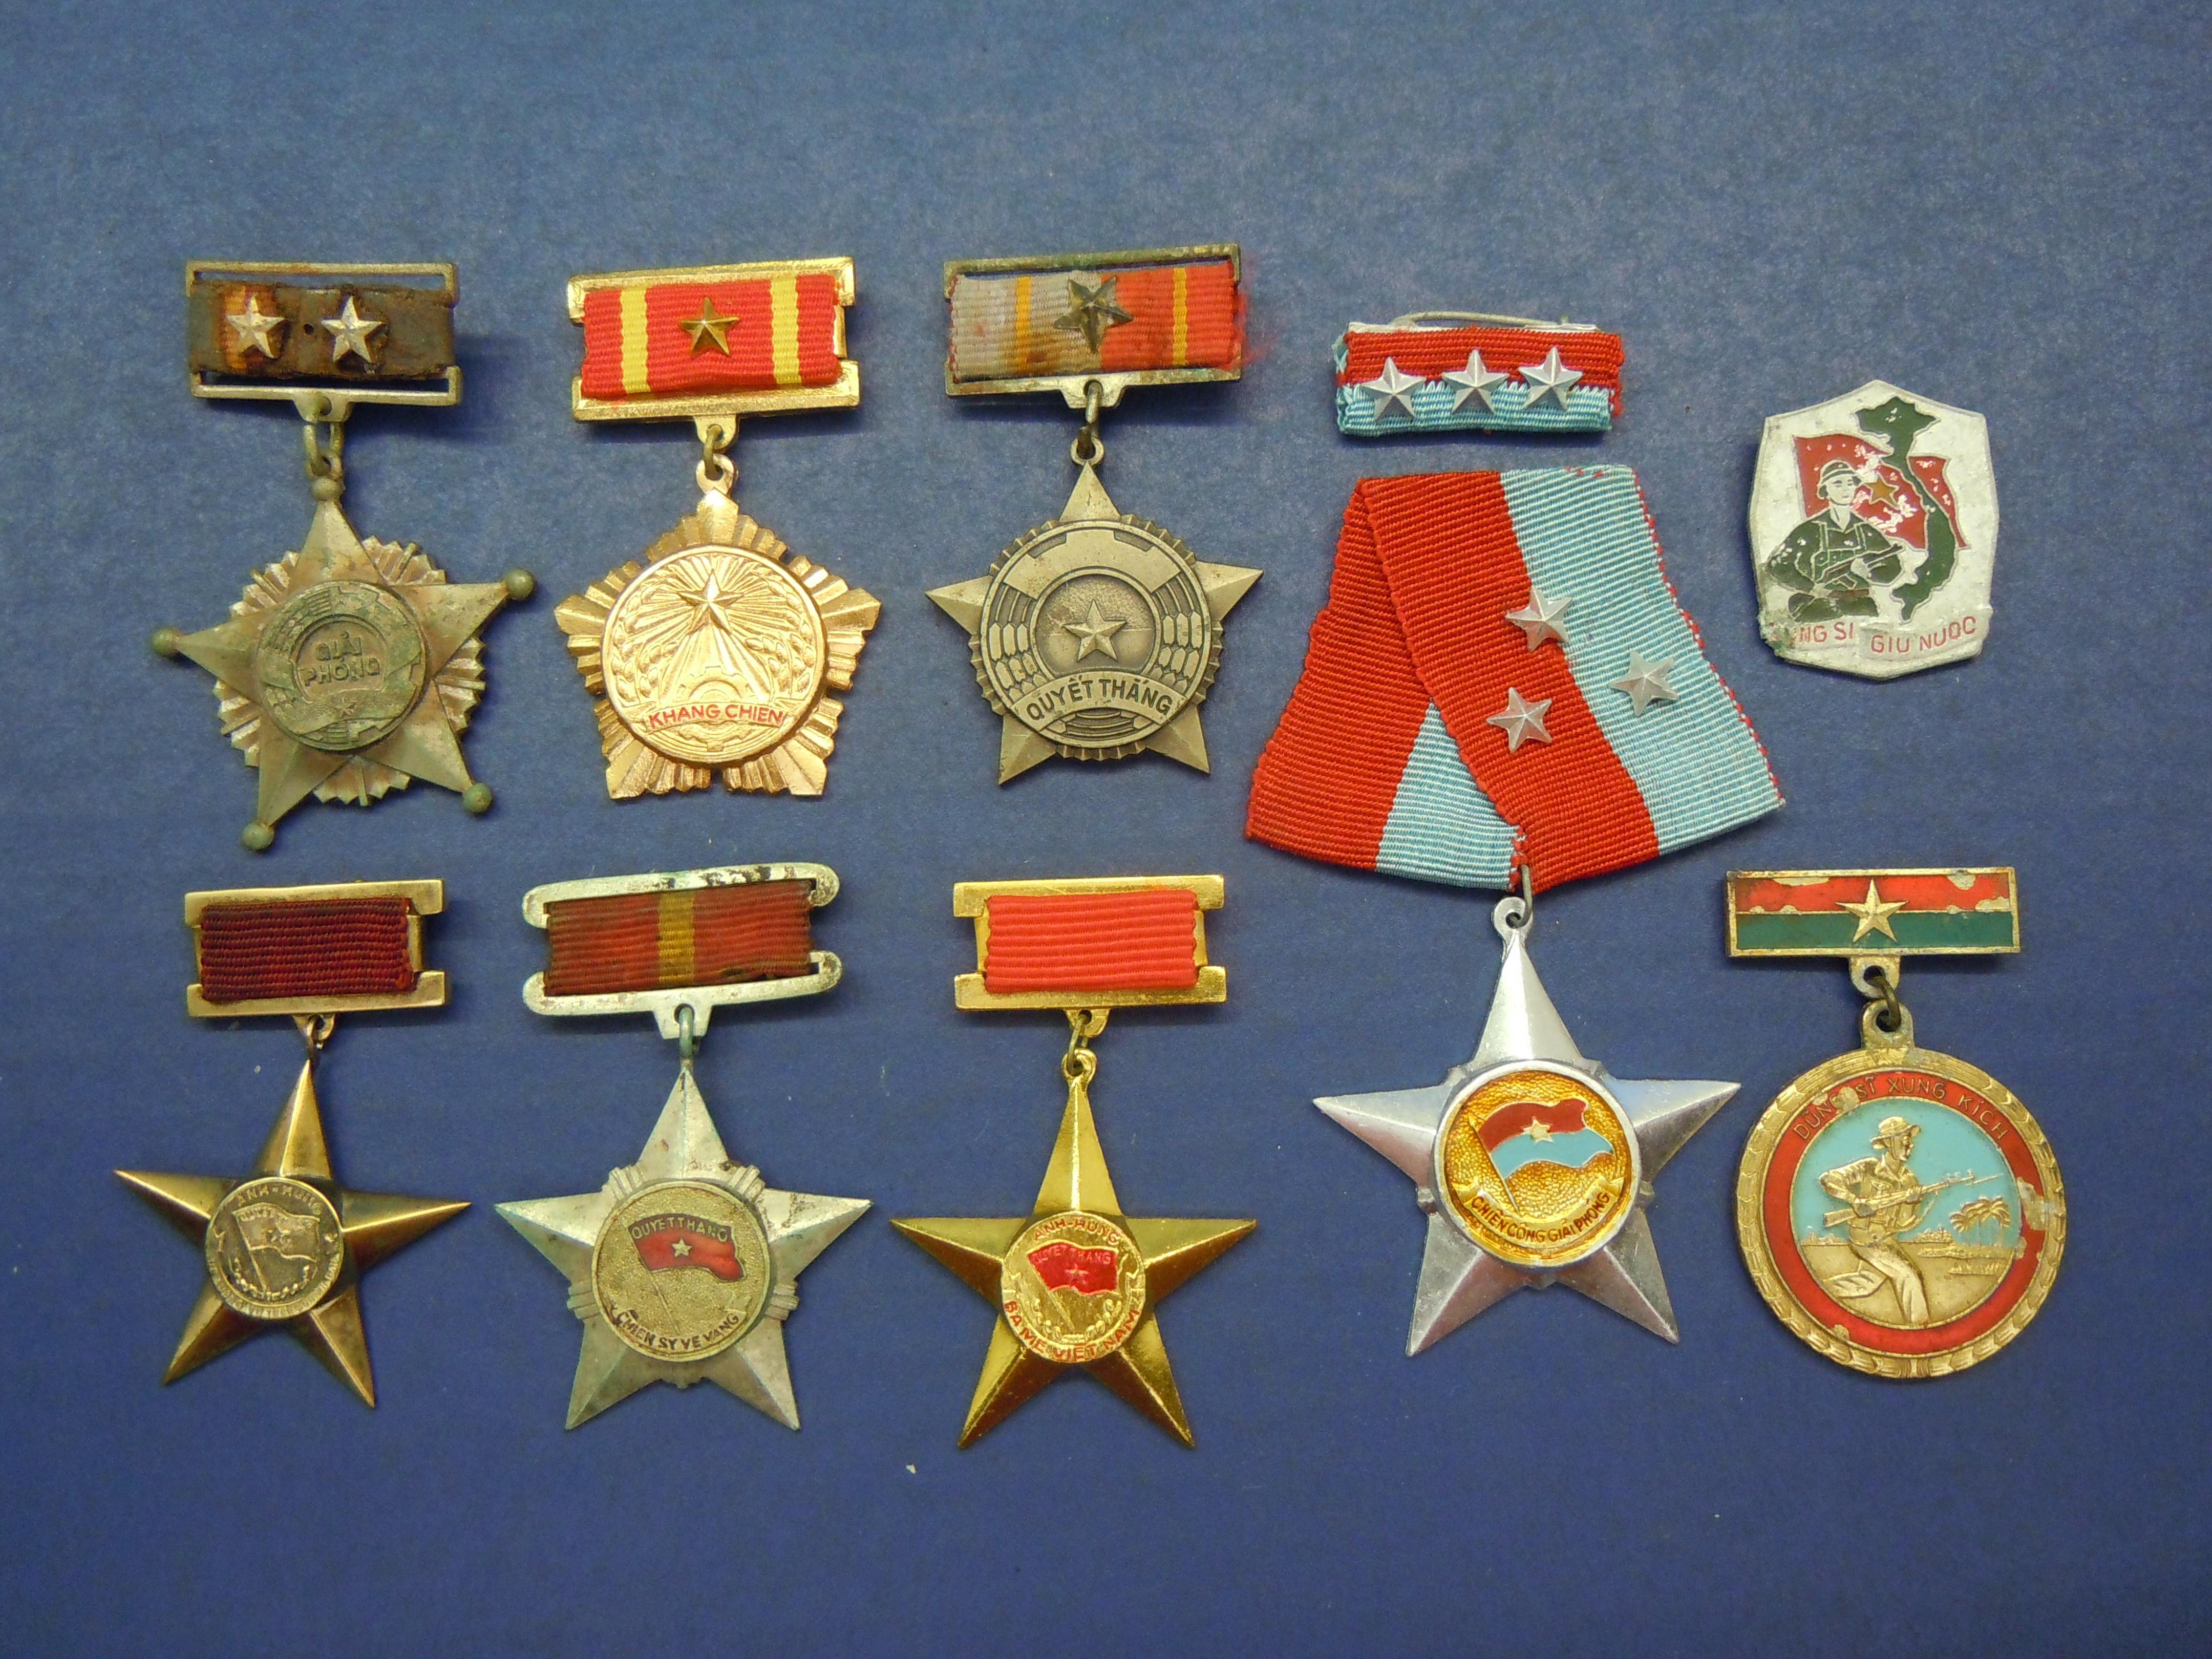 Vietnam War Viet Cong Medals Including: Soldier of Liberation 1st